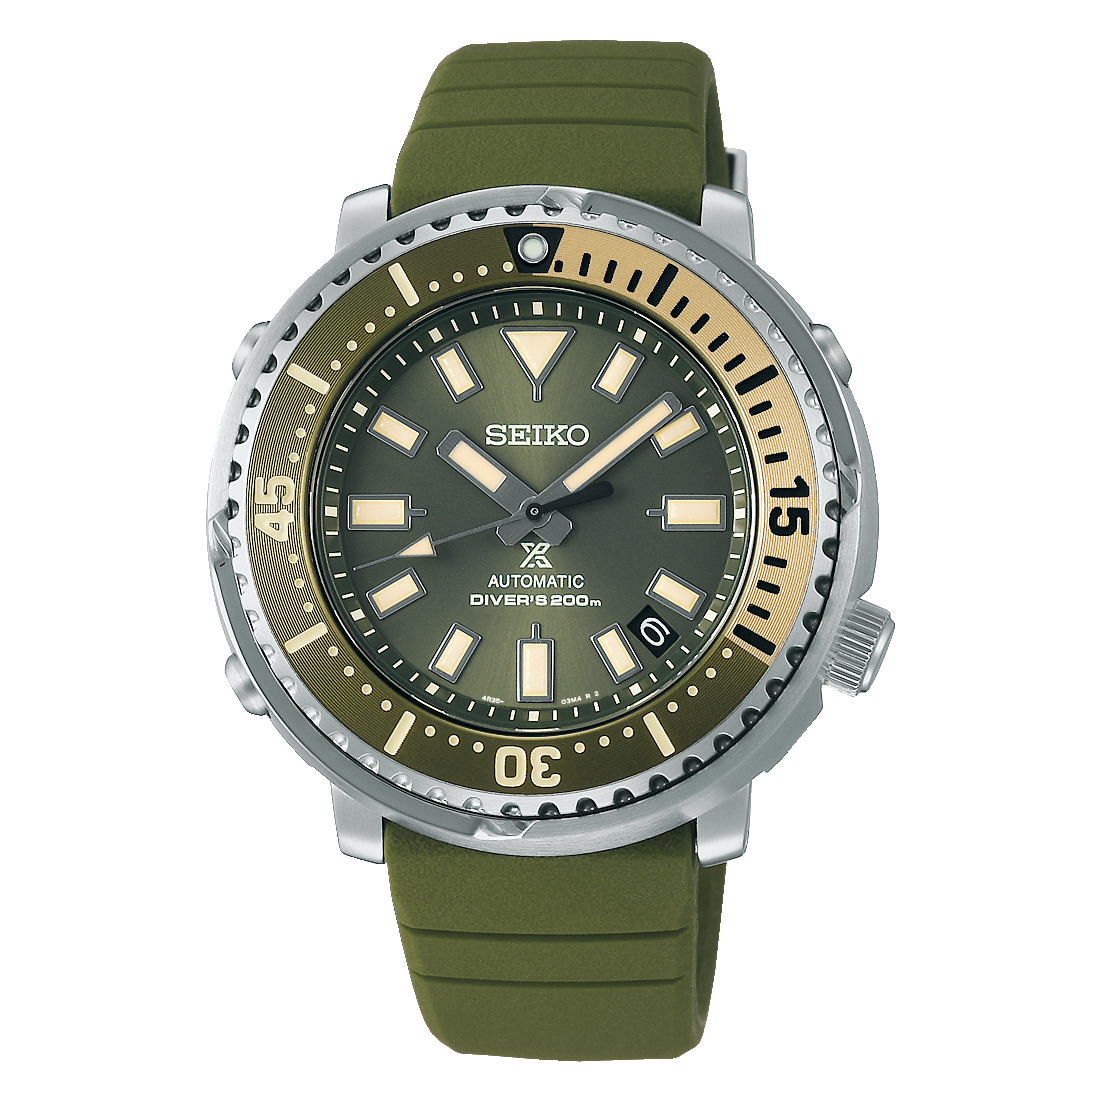 Orologio seiko prospex SRPF83 K1